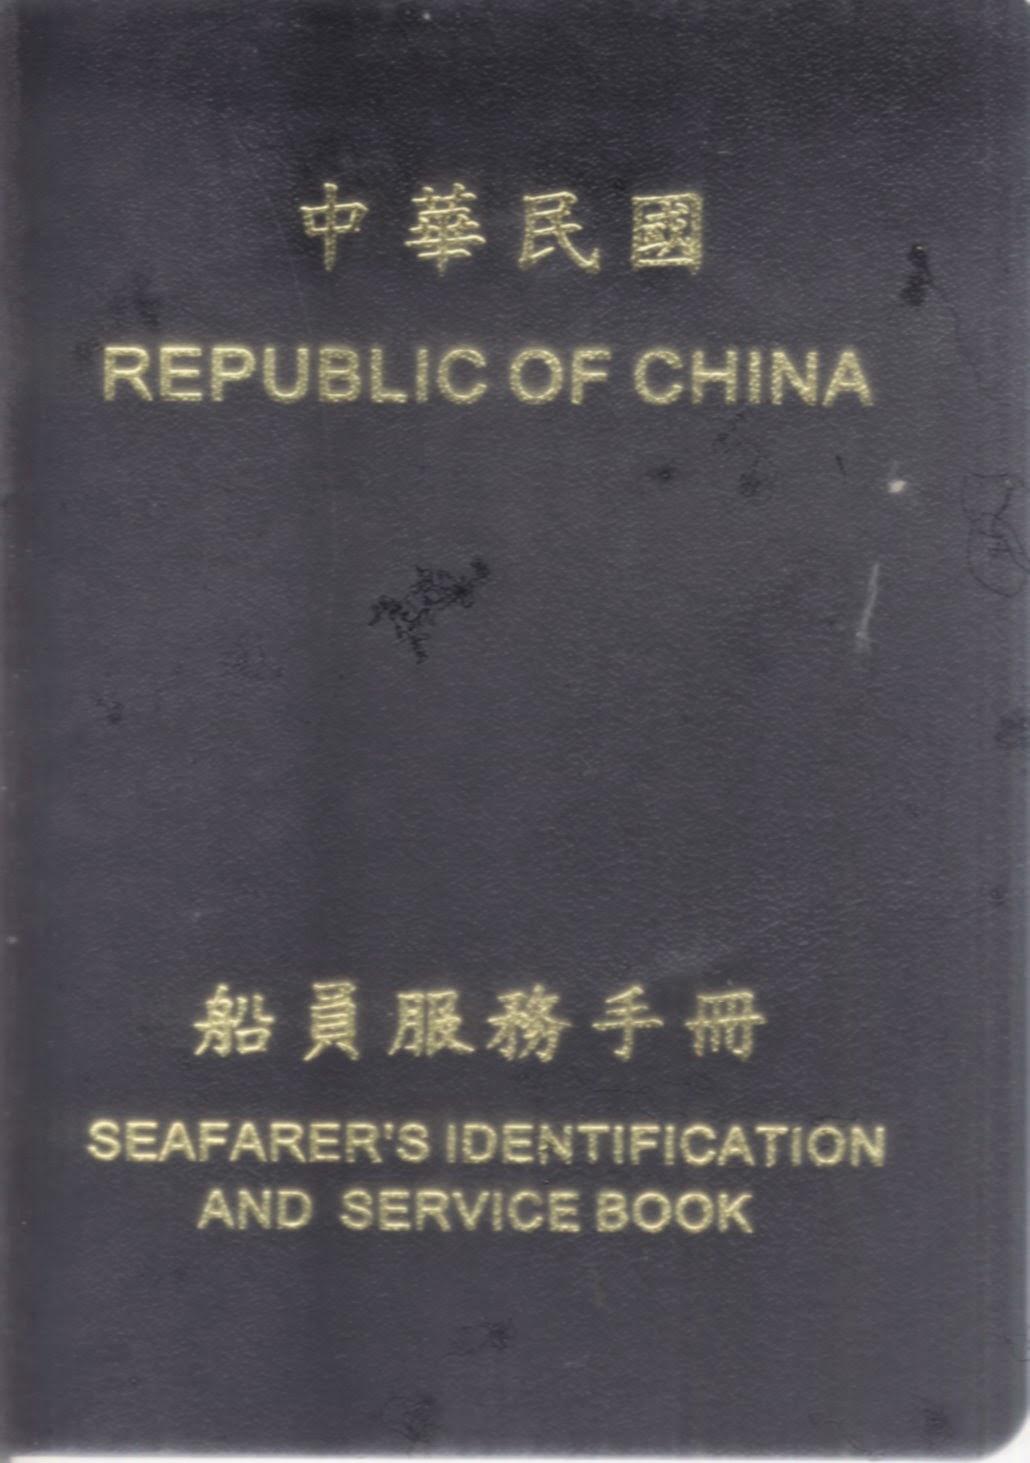 OCEAN: 中華民國新版海員手冊 (seafarer's identification and service book)